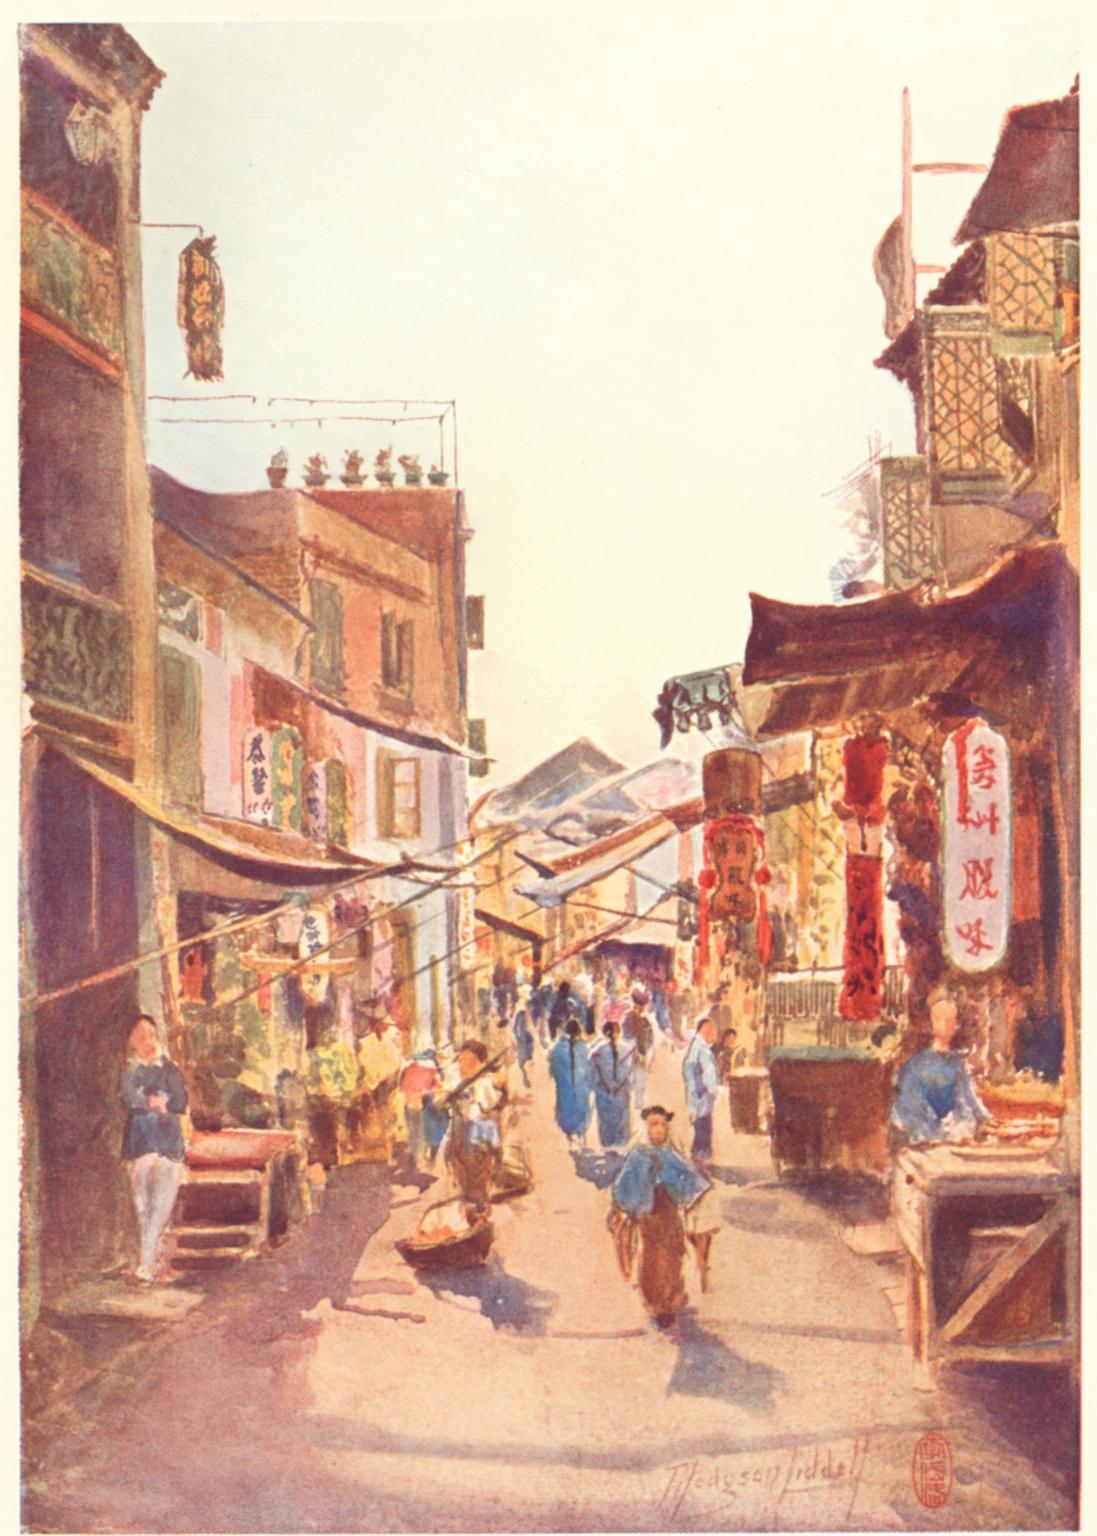 [Macao street scene]